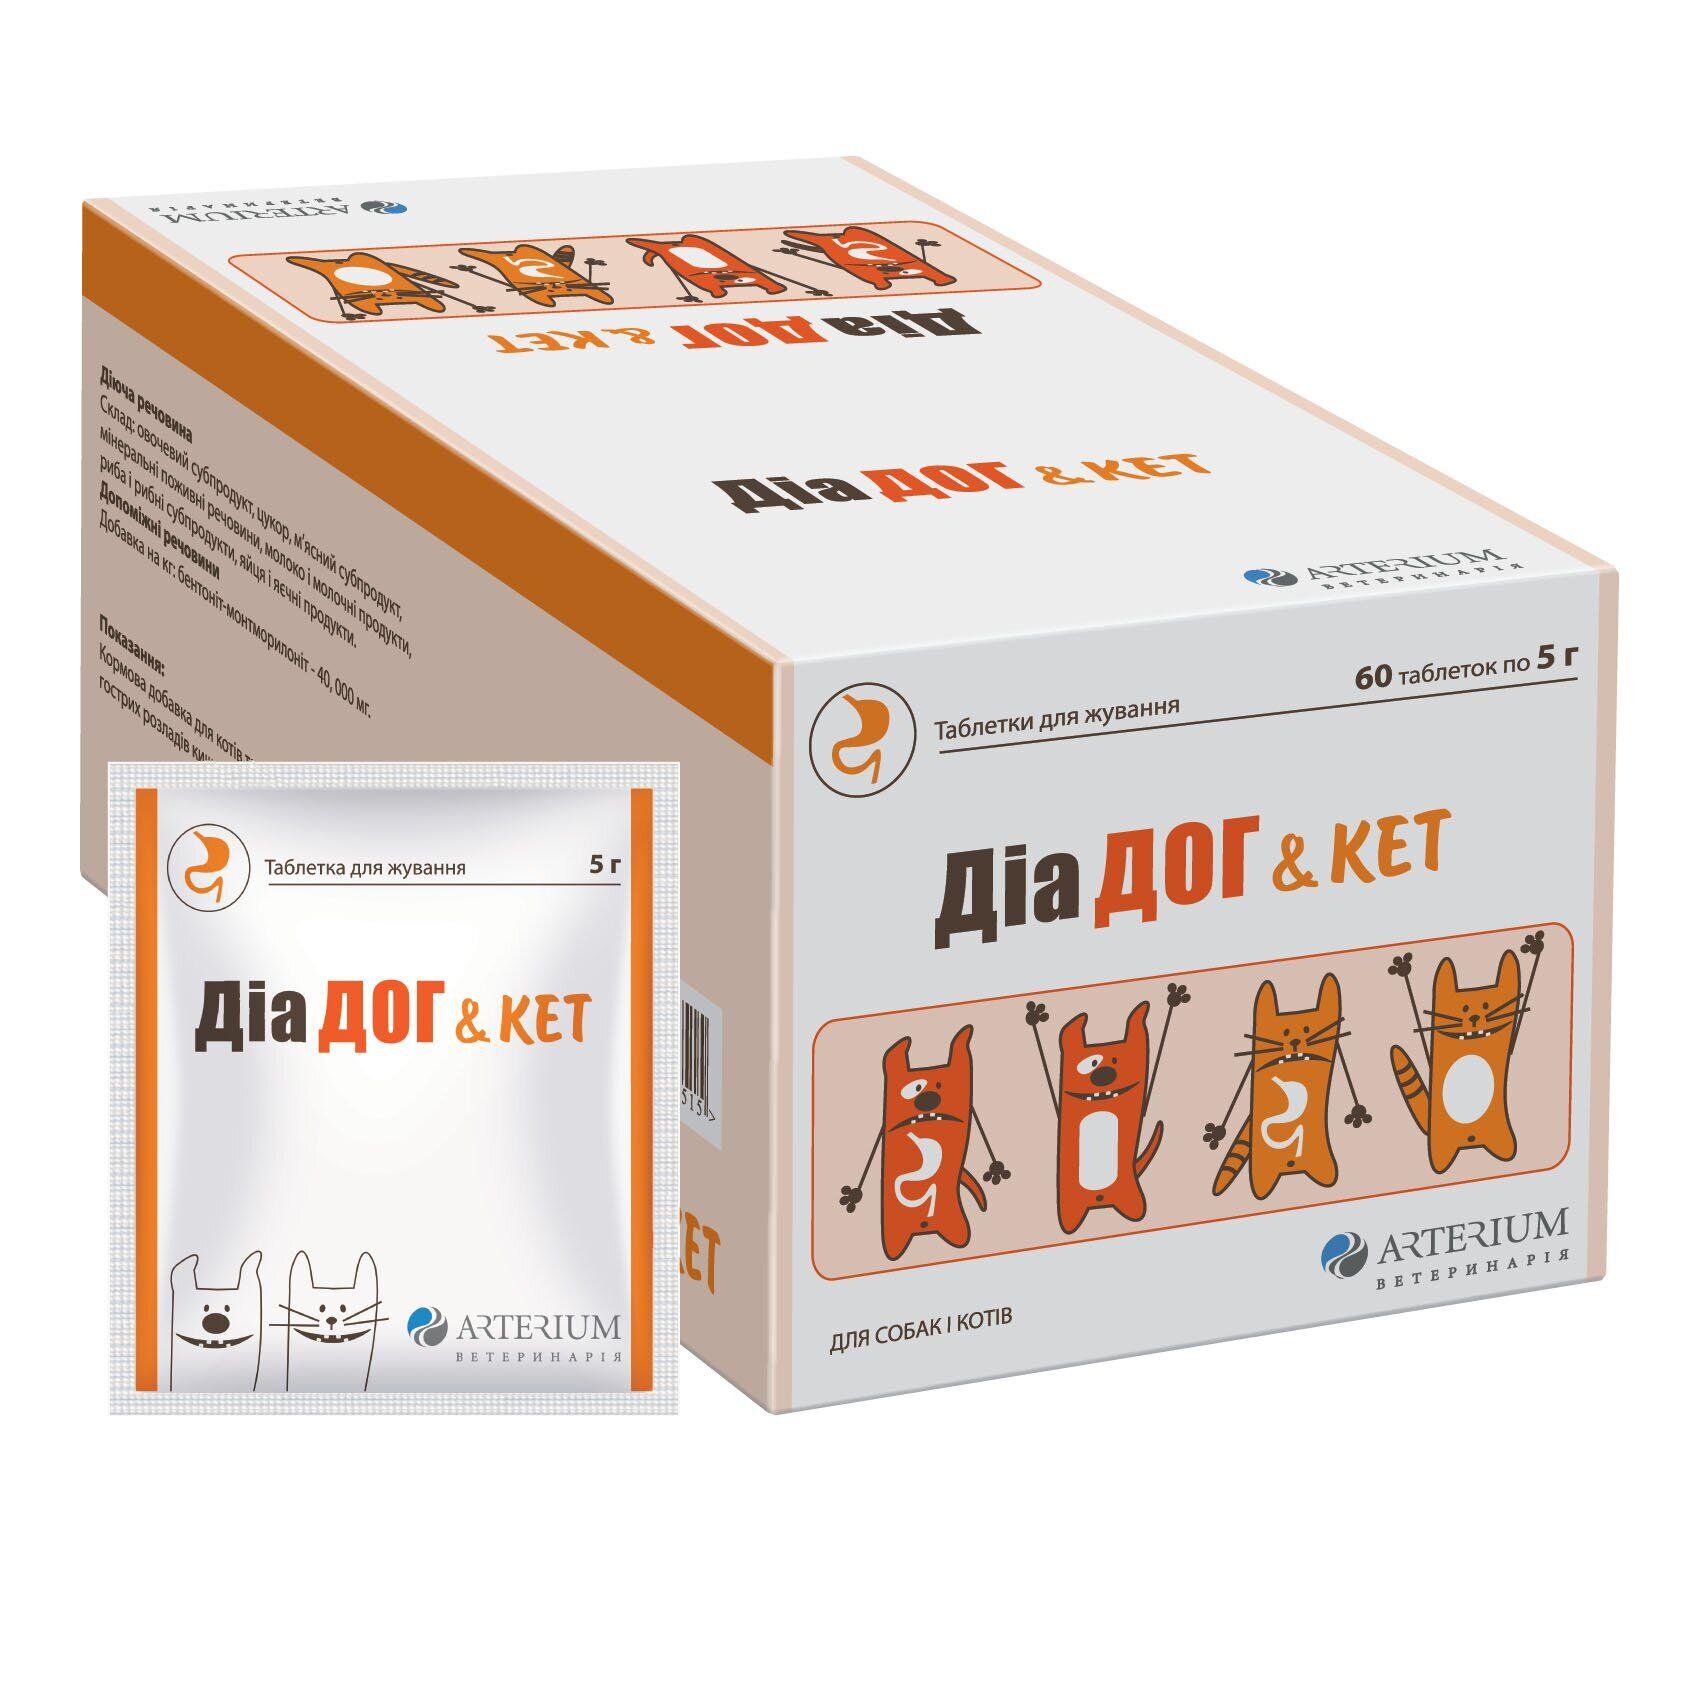 Arterium Dia Dog and Cat (Діа Дог і Кет) – таблетки при кишкових розладах